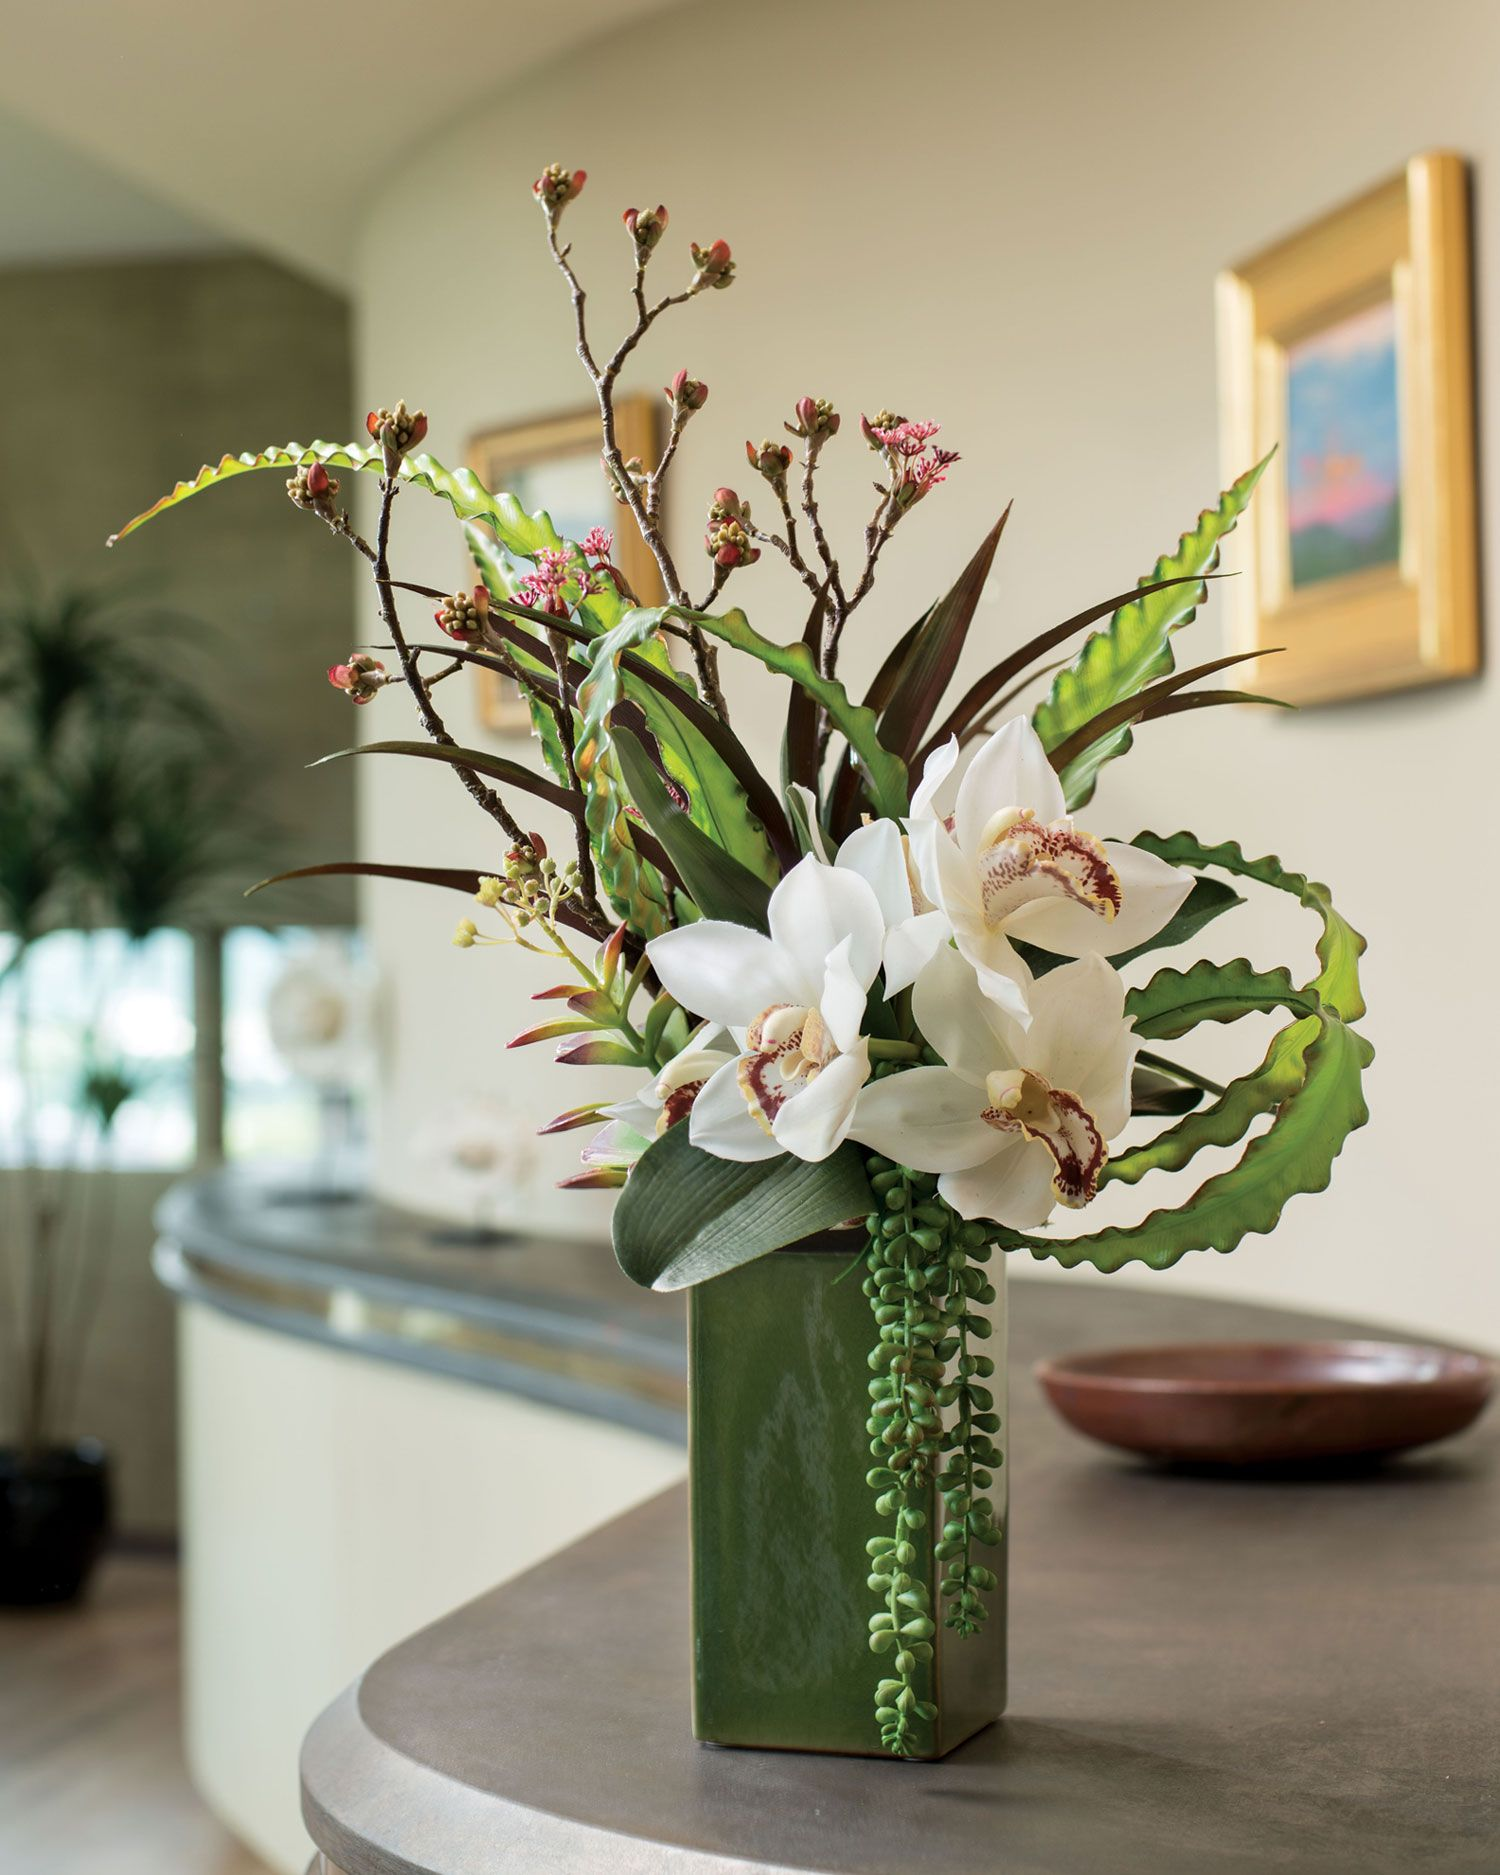 Cymbidium Orchid Aloe Branchsilk Arrangement Large Flower Arrangements Artificial Flower Arrangements Modern Flower Arrangements